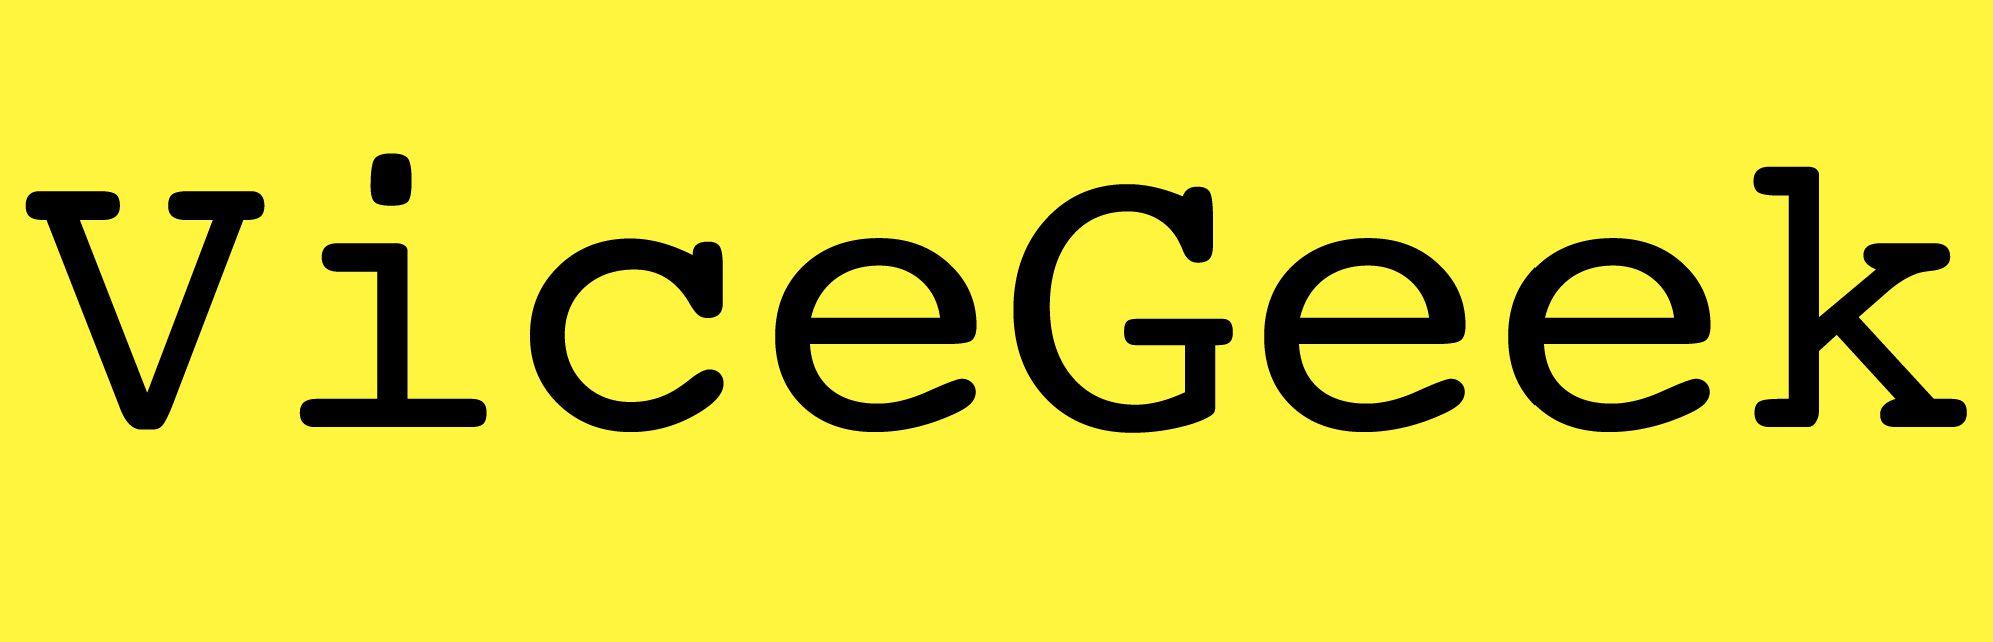 ViceGeek